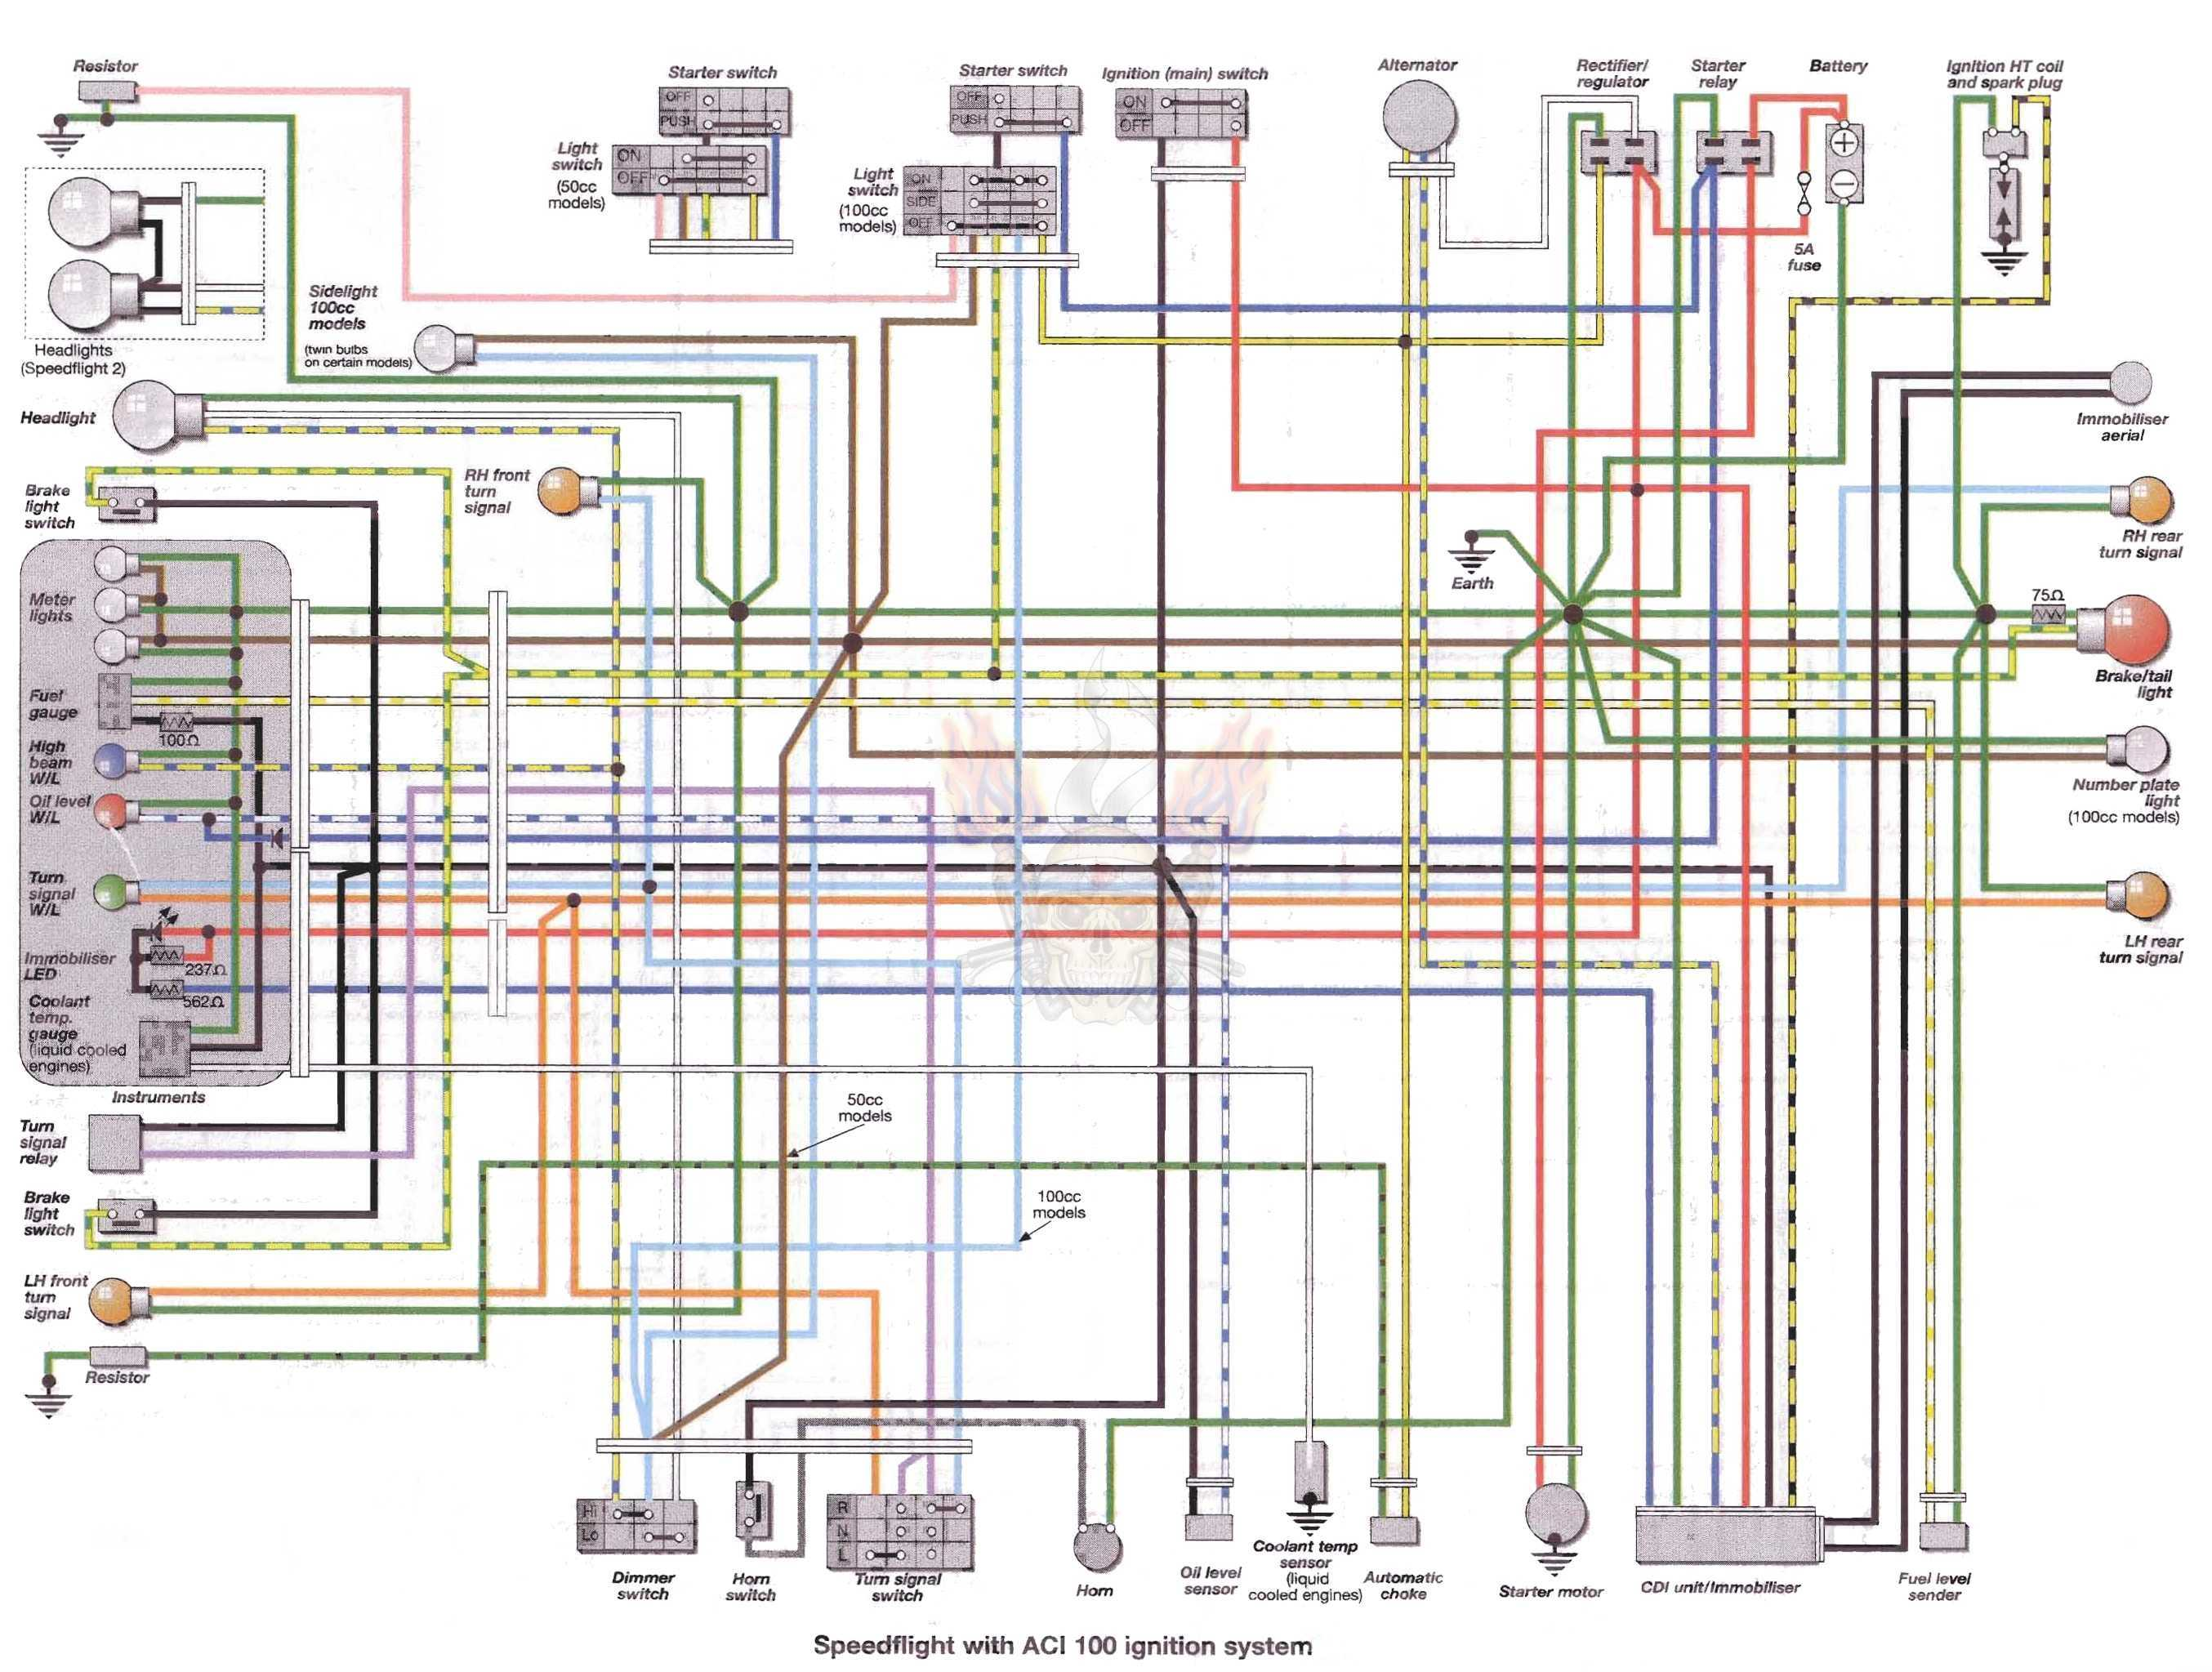 Ktm Xcf 350 Wiring Diagrams Electrical 300 Exc Diagram 2013 Specs 10